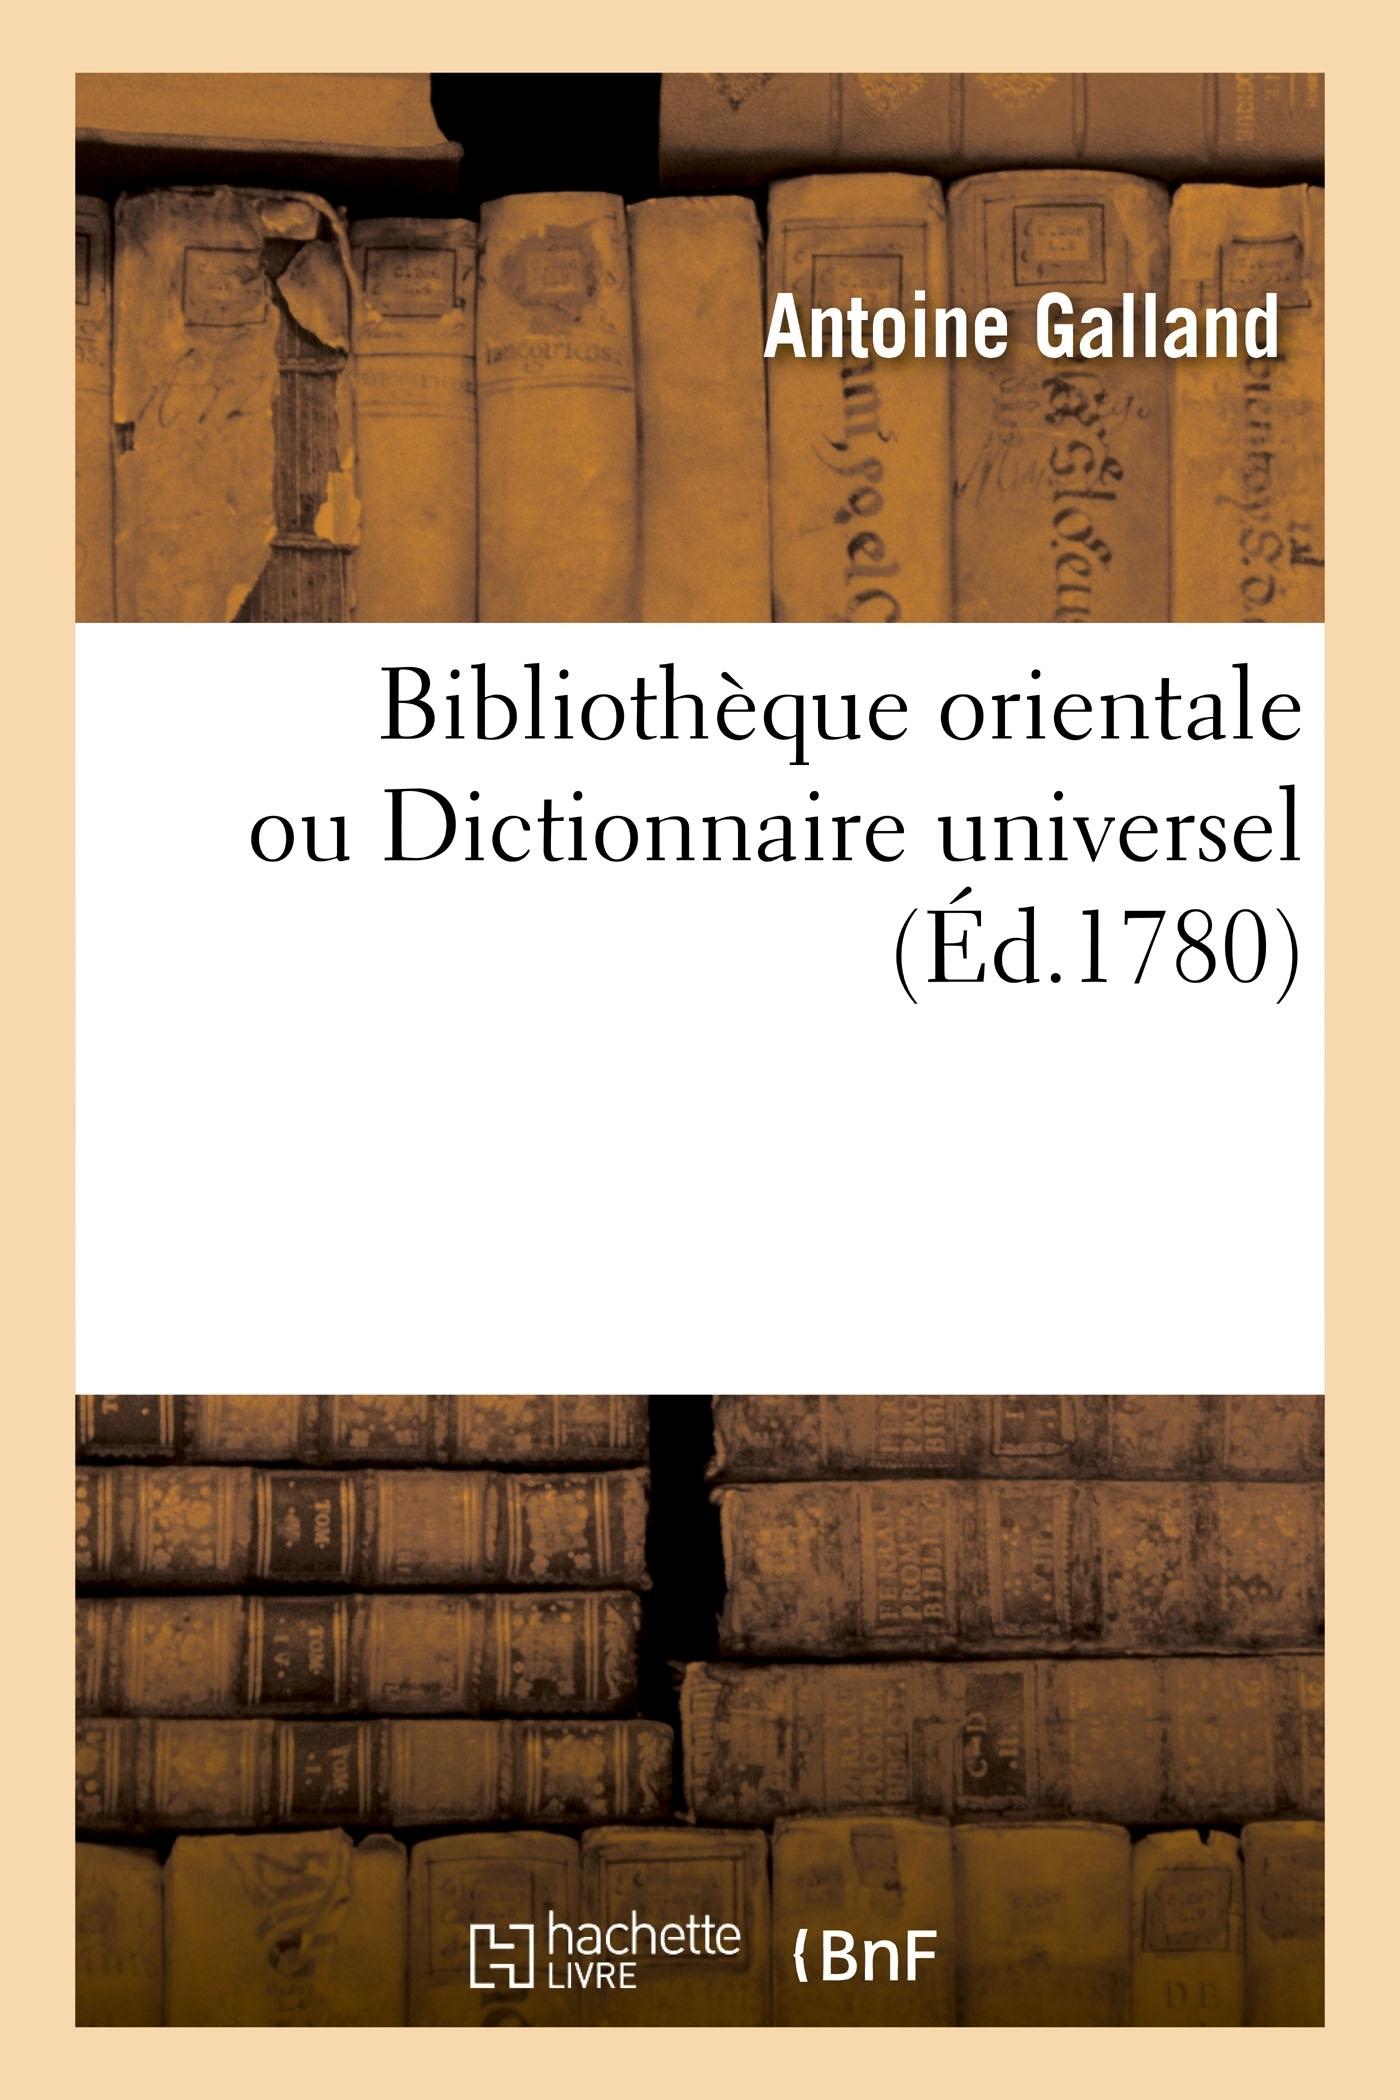 BIBLIOTHEQUE ORIENTALE OU DICTIONNAIRE UNIVERSEL